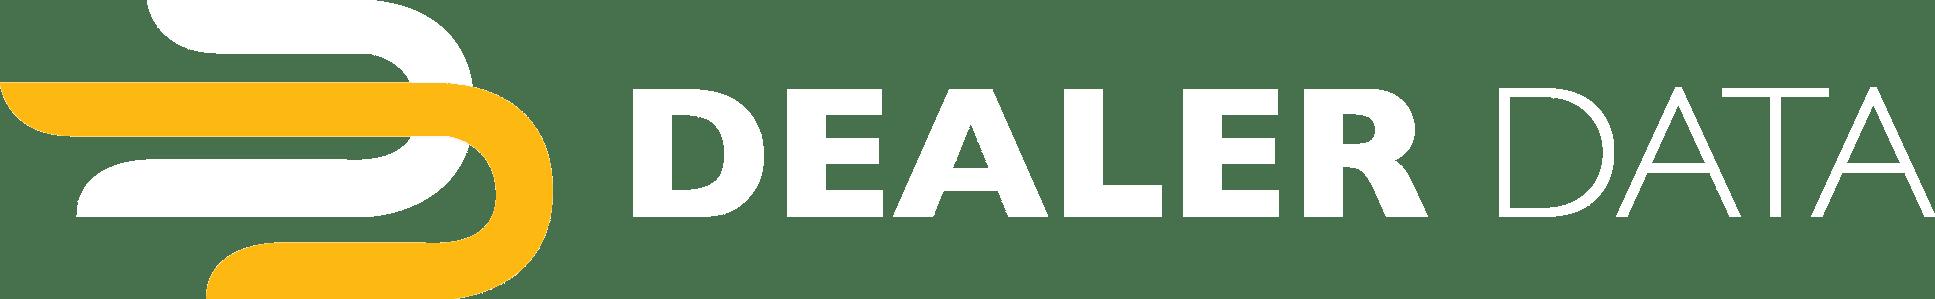 DealerData.landscape.white.logo_